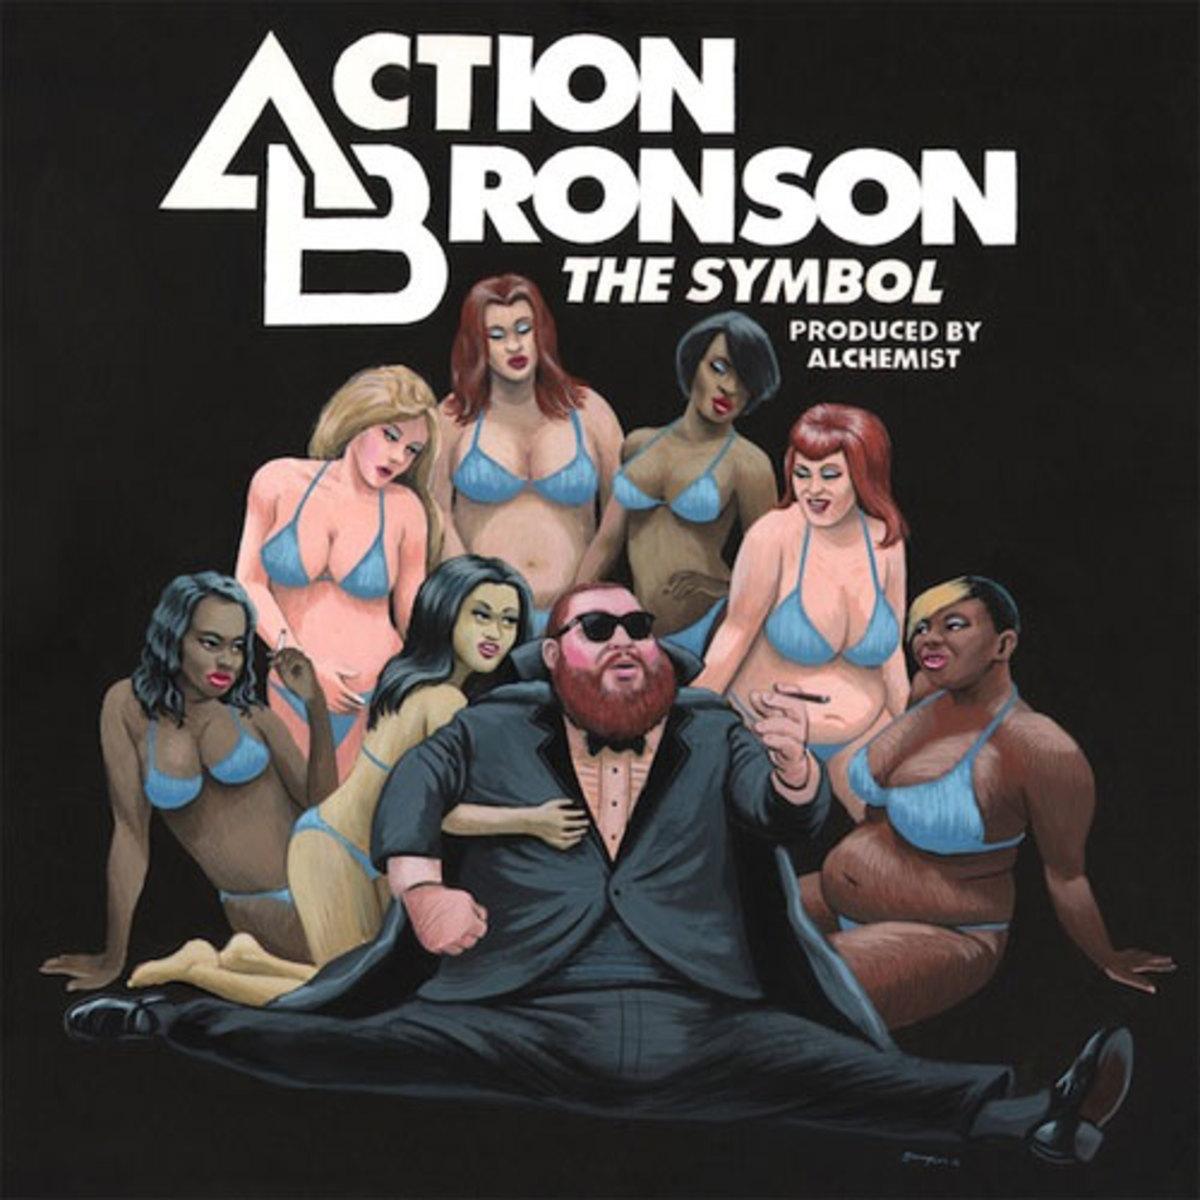 actionbronson-symbol.jpg